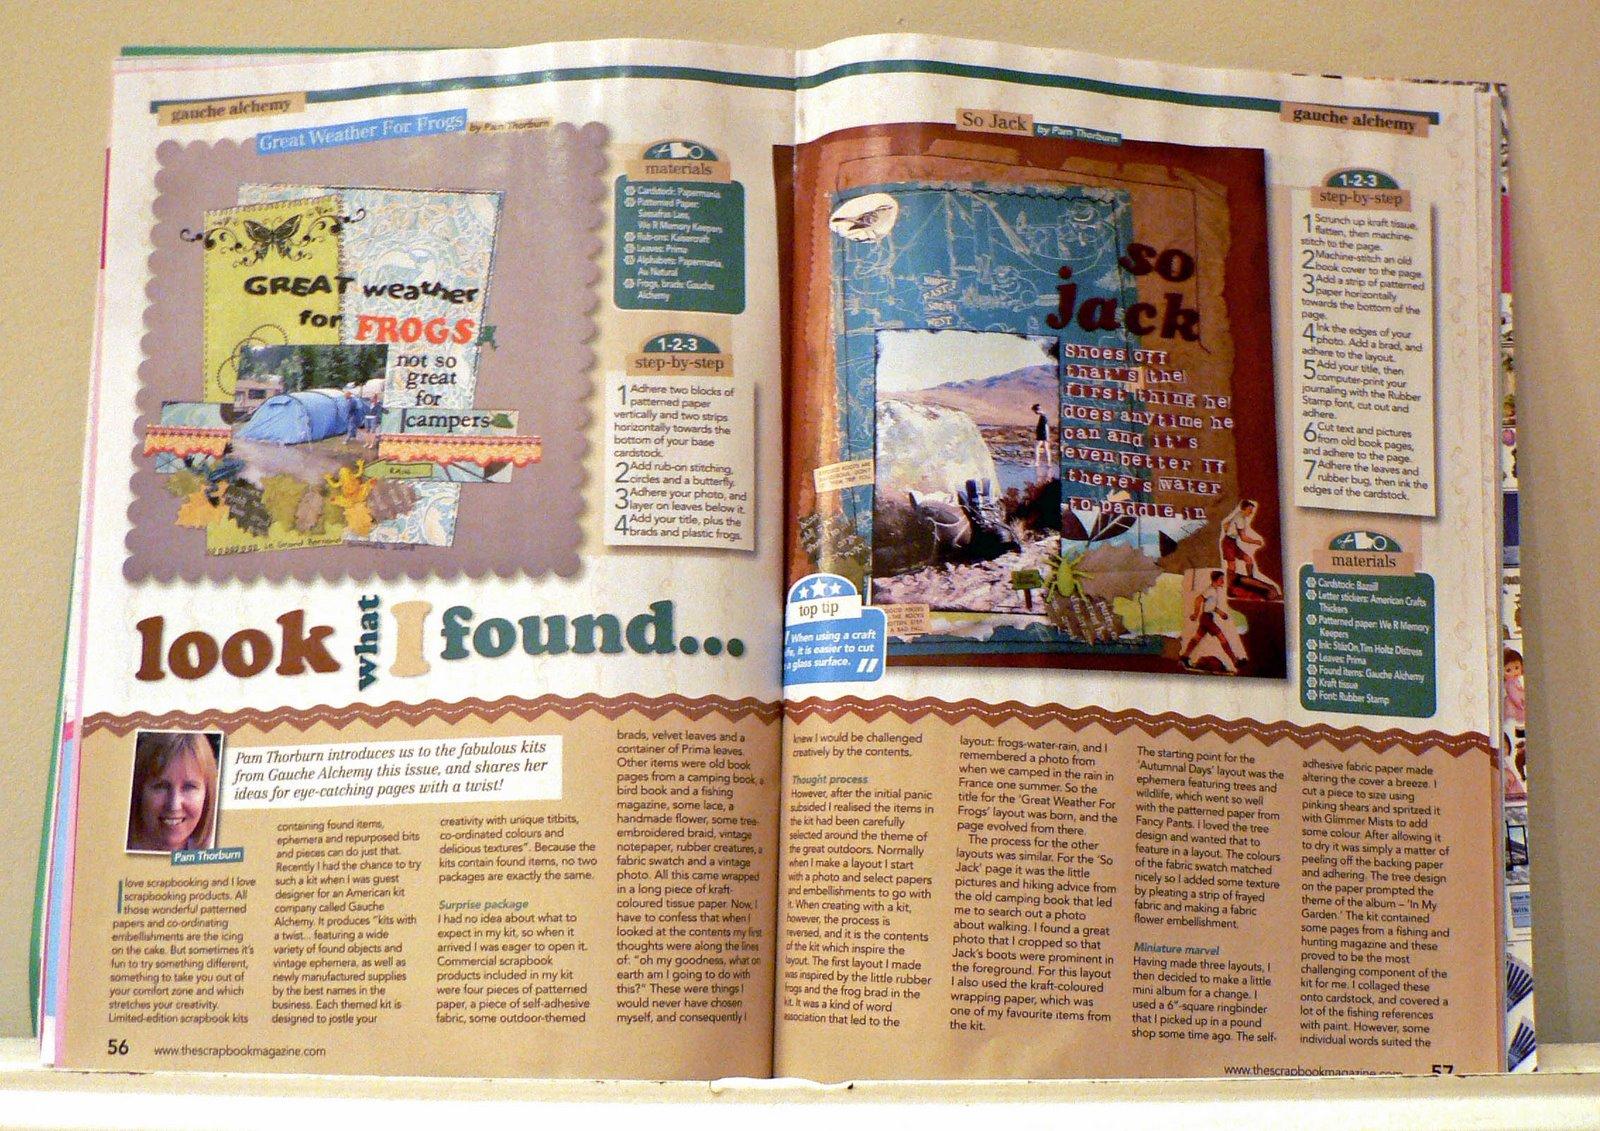 How to scrapbook magazines - The Scrapbook Magazine